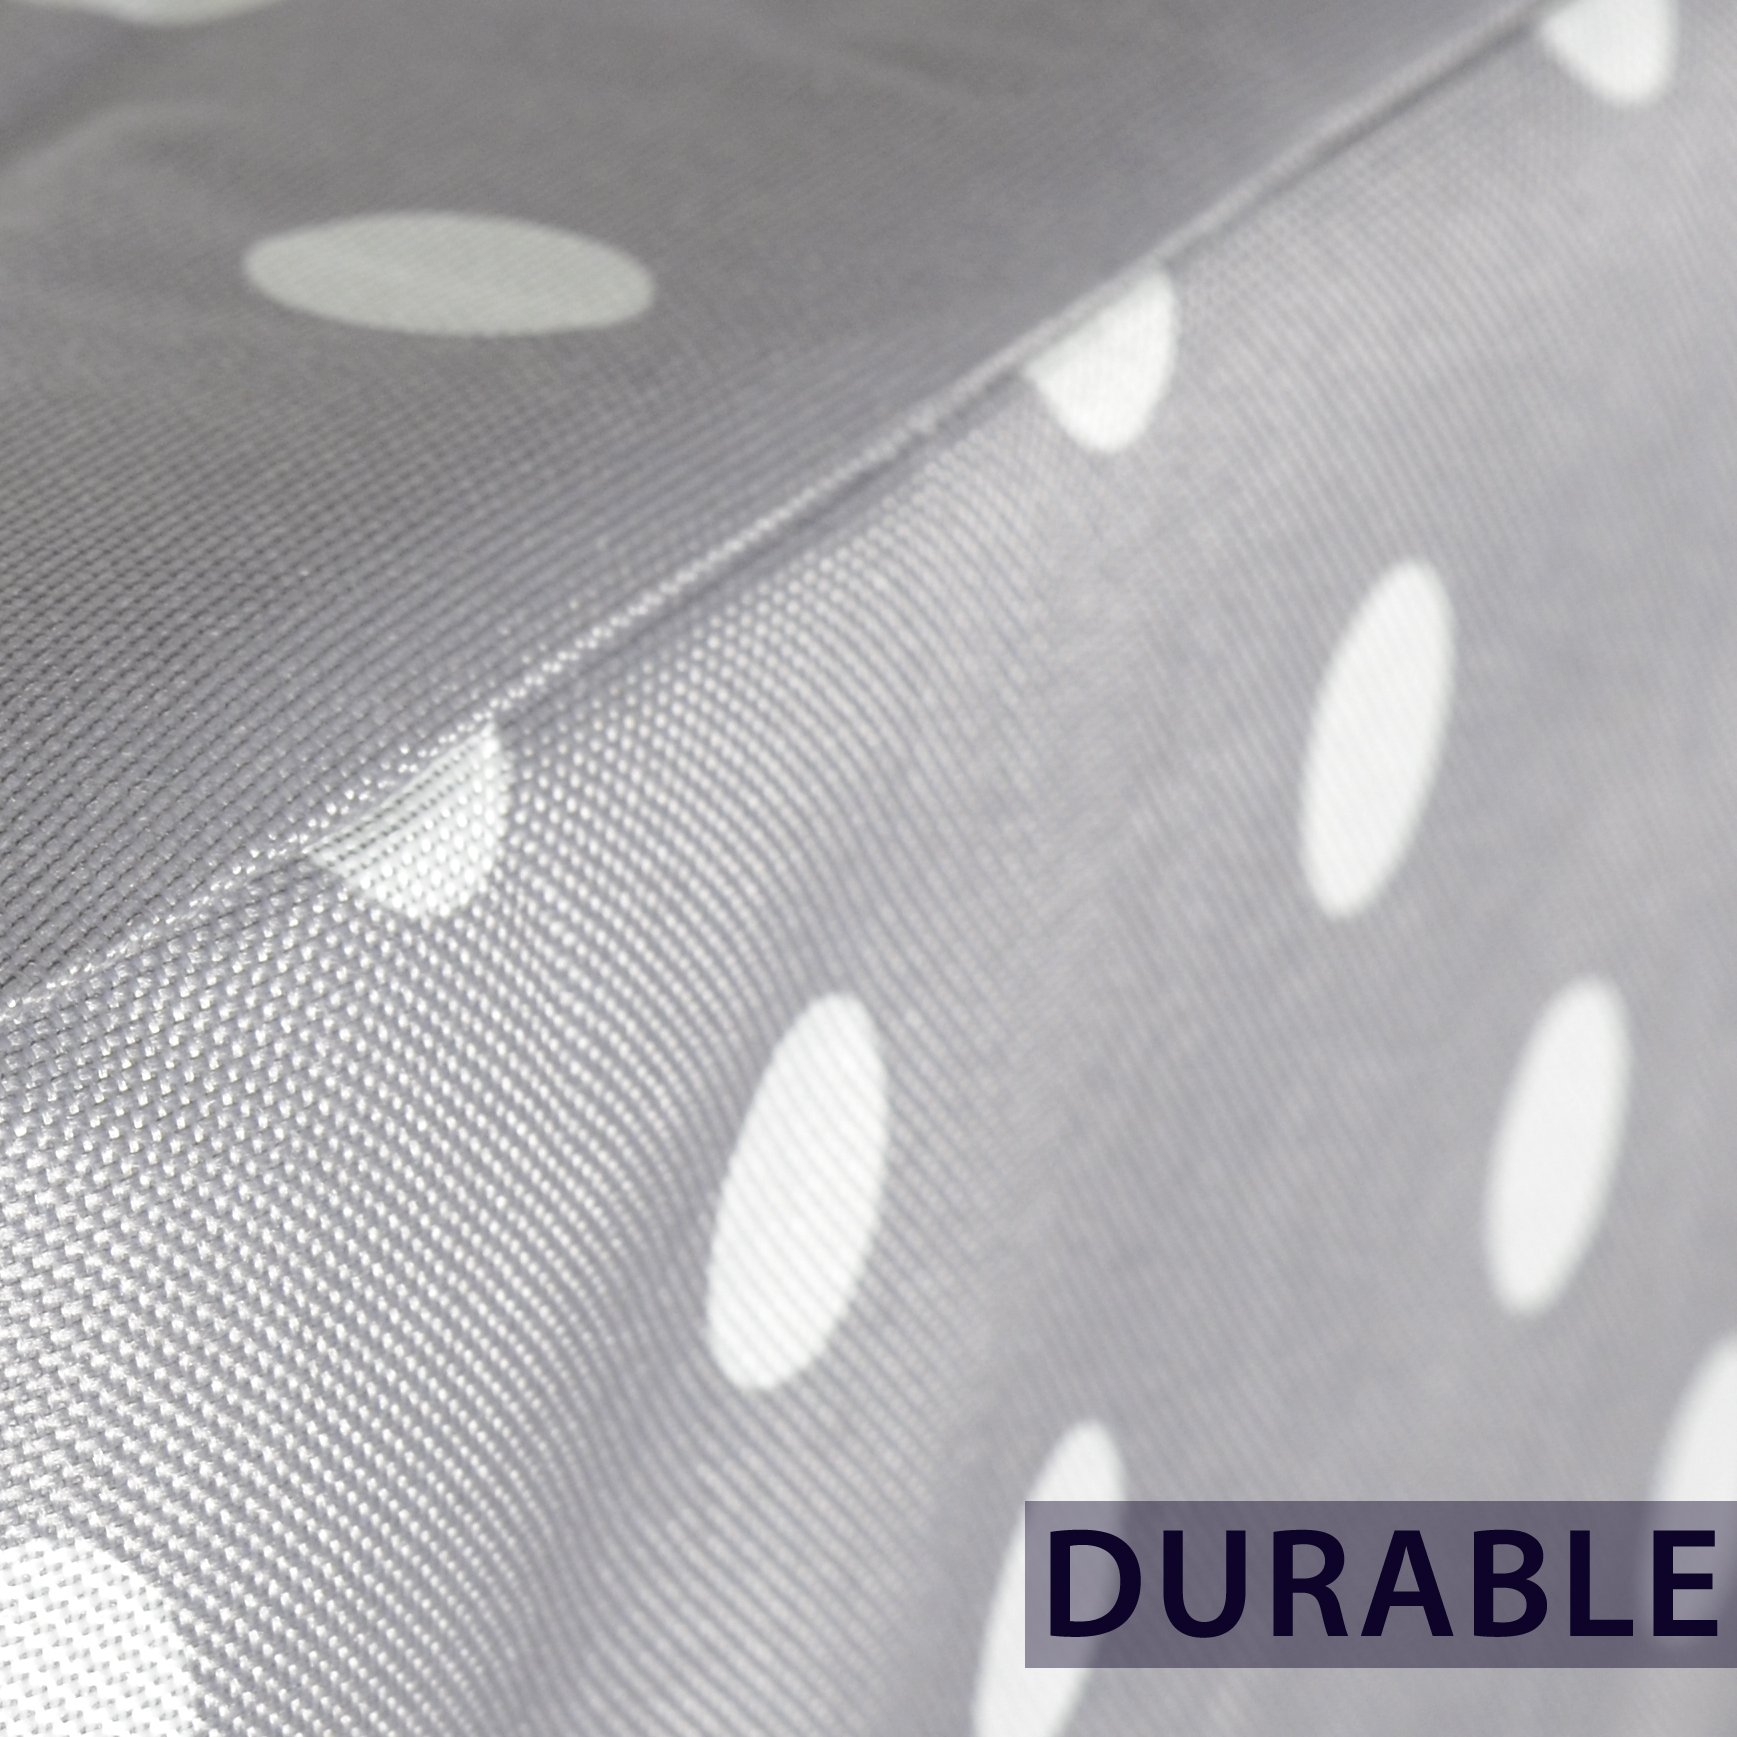 Milliard Crib Mattress and Toddler Bed Mattress | Hypoallergenic + Waterproof Encasement | 27.5''x52''x5'' by Milliard (Image #3)